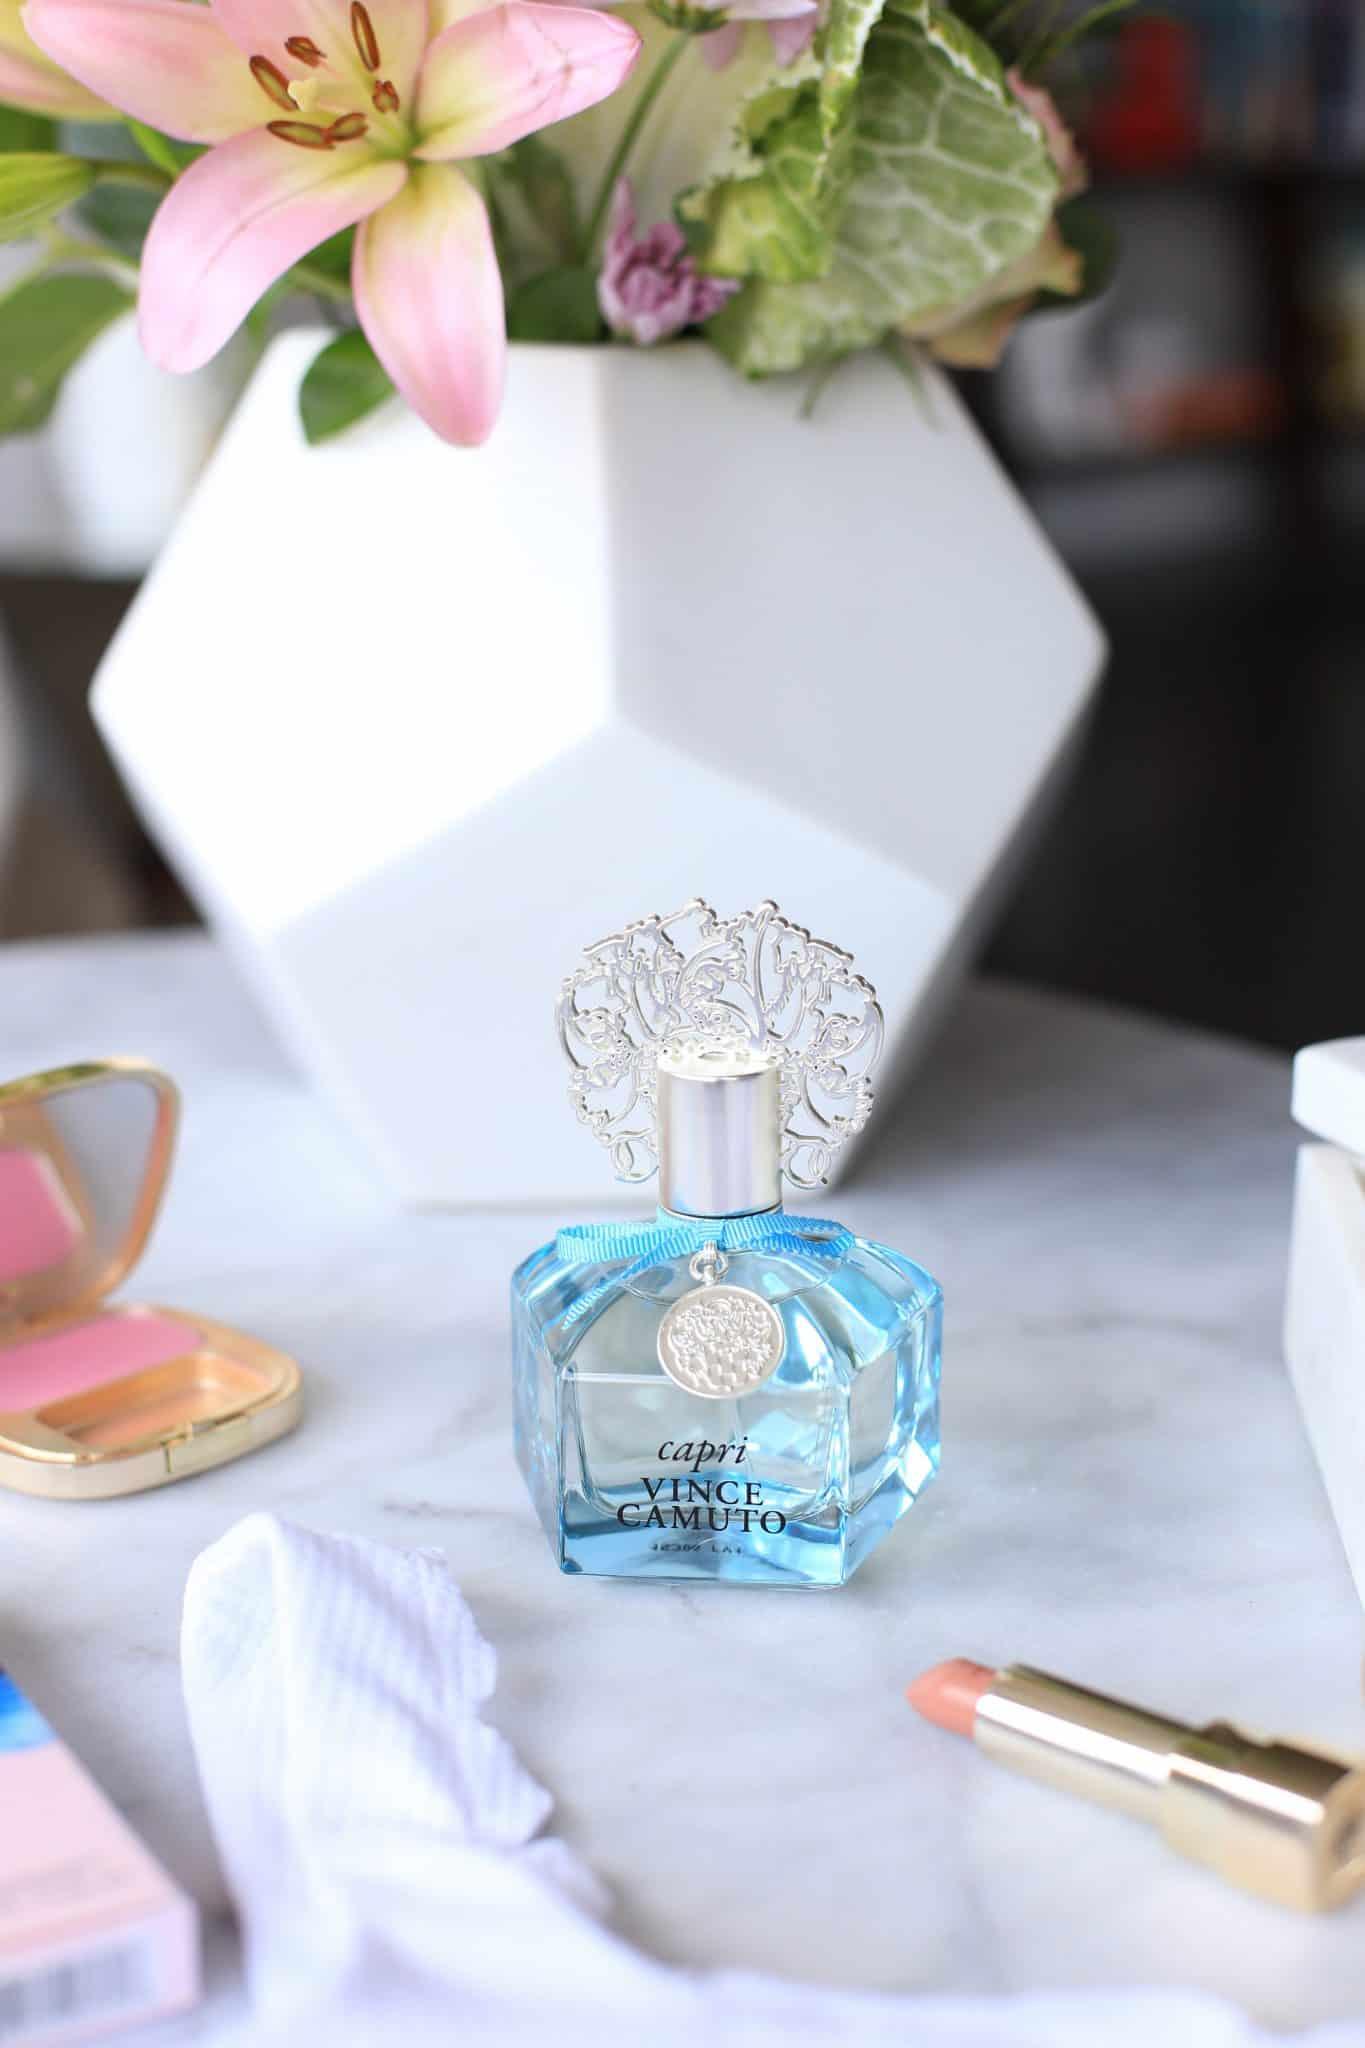 capri vince camuto fragrance - 1